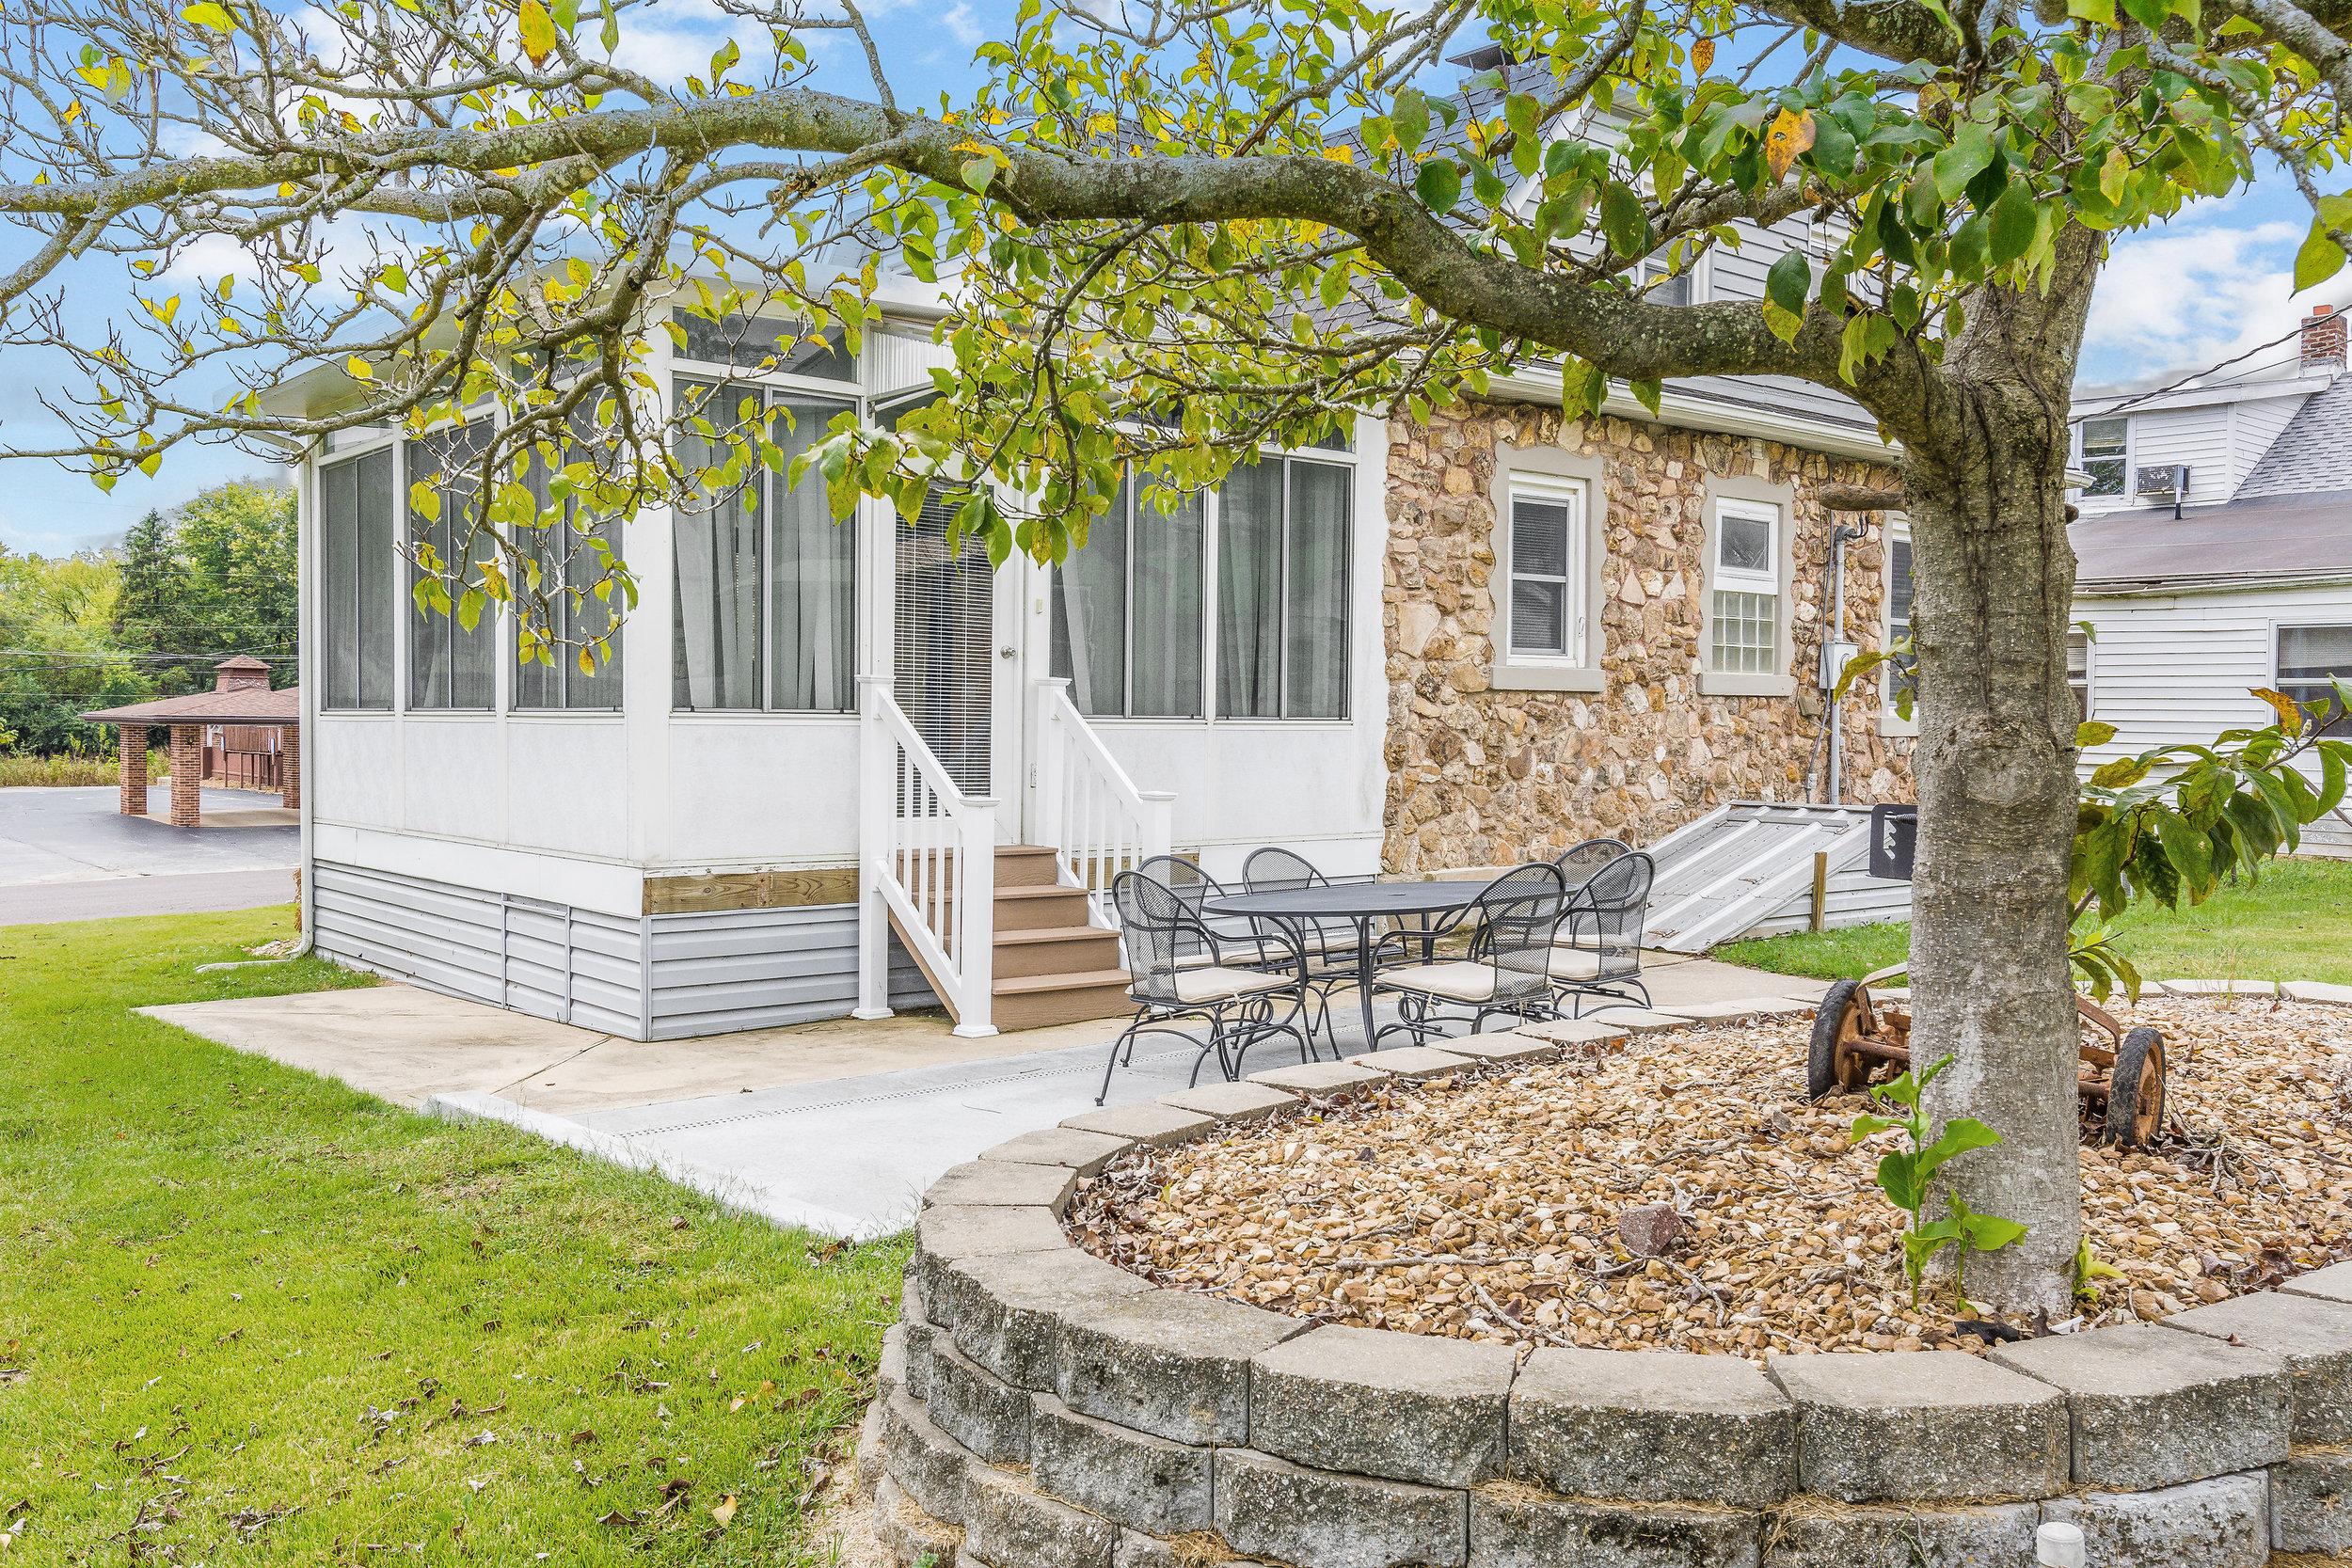 Stone-Cottage-Hermann-Missouri-vacation-rental-13-1116.jpg